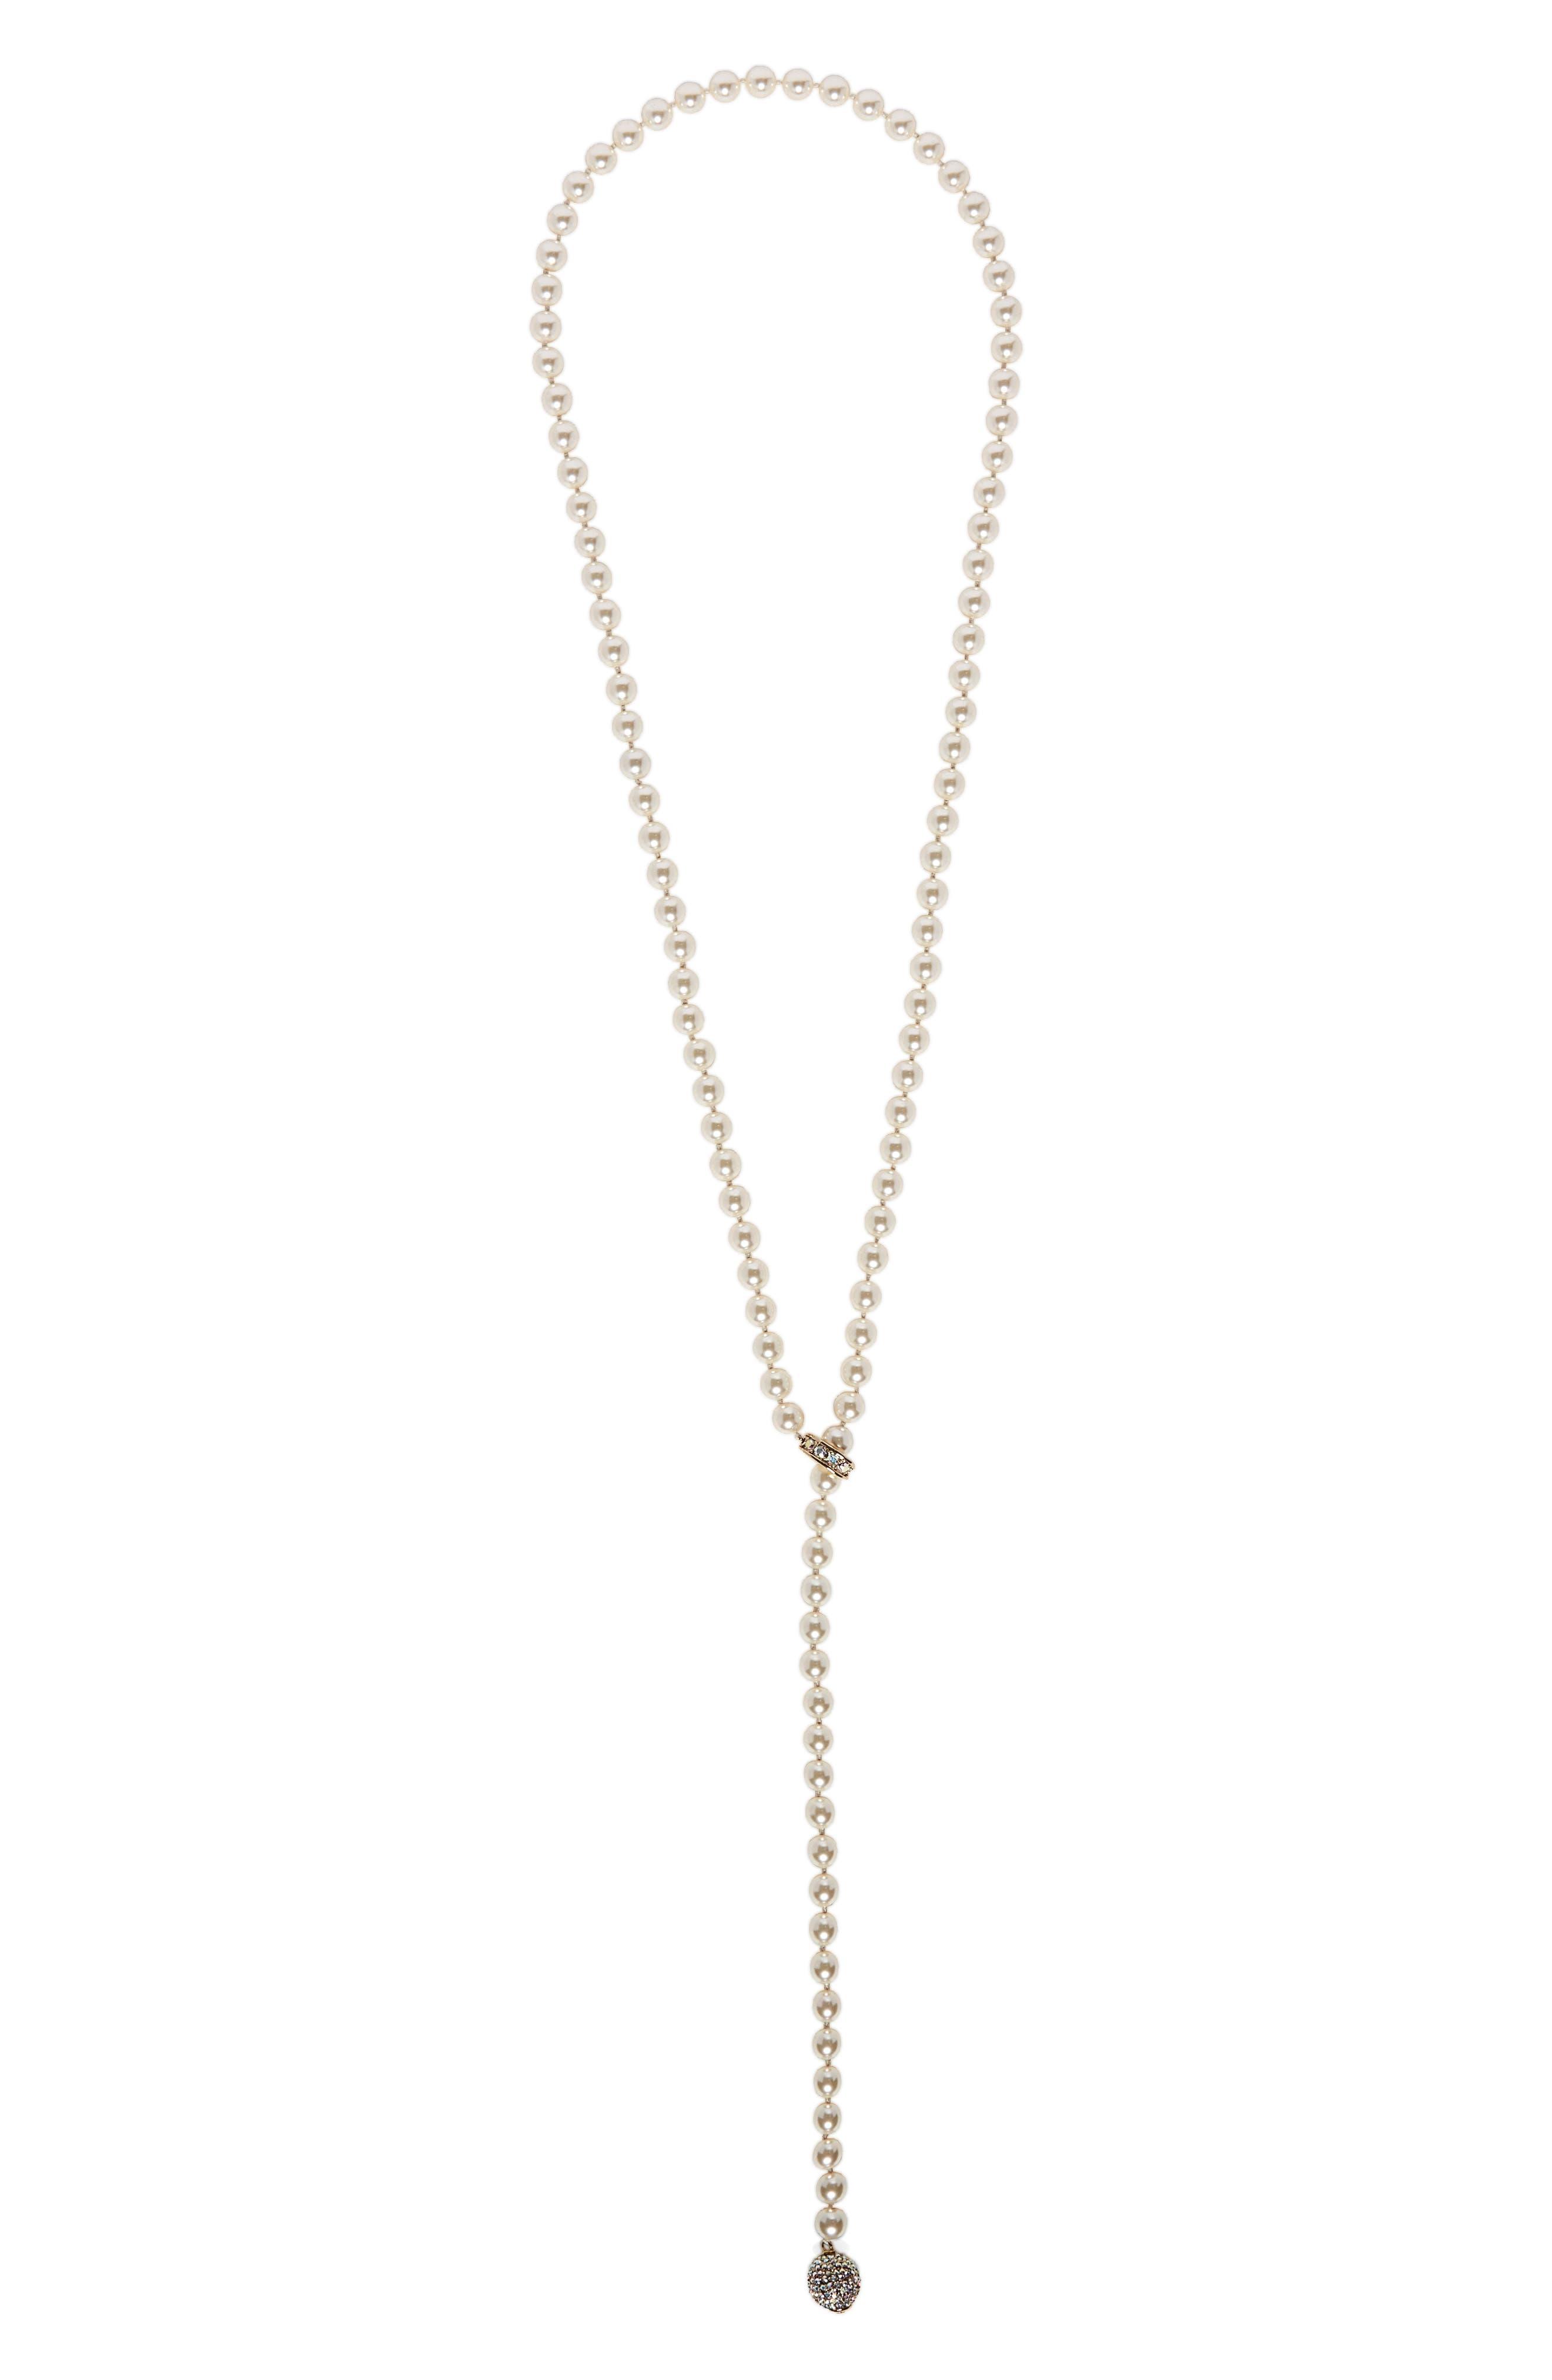 Swarovski Imitation Pearl & Crystal Lariat Necklace,                             Main thumbnail 1, color,                             710